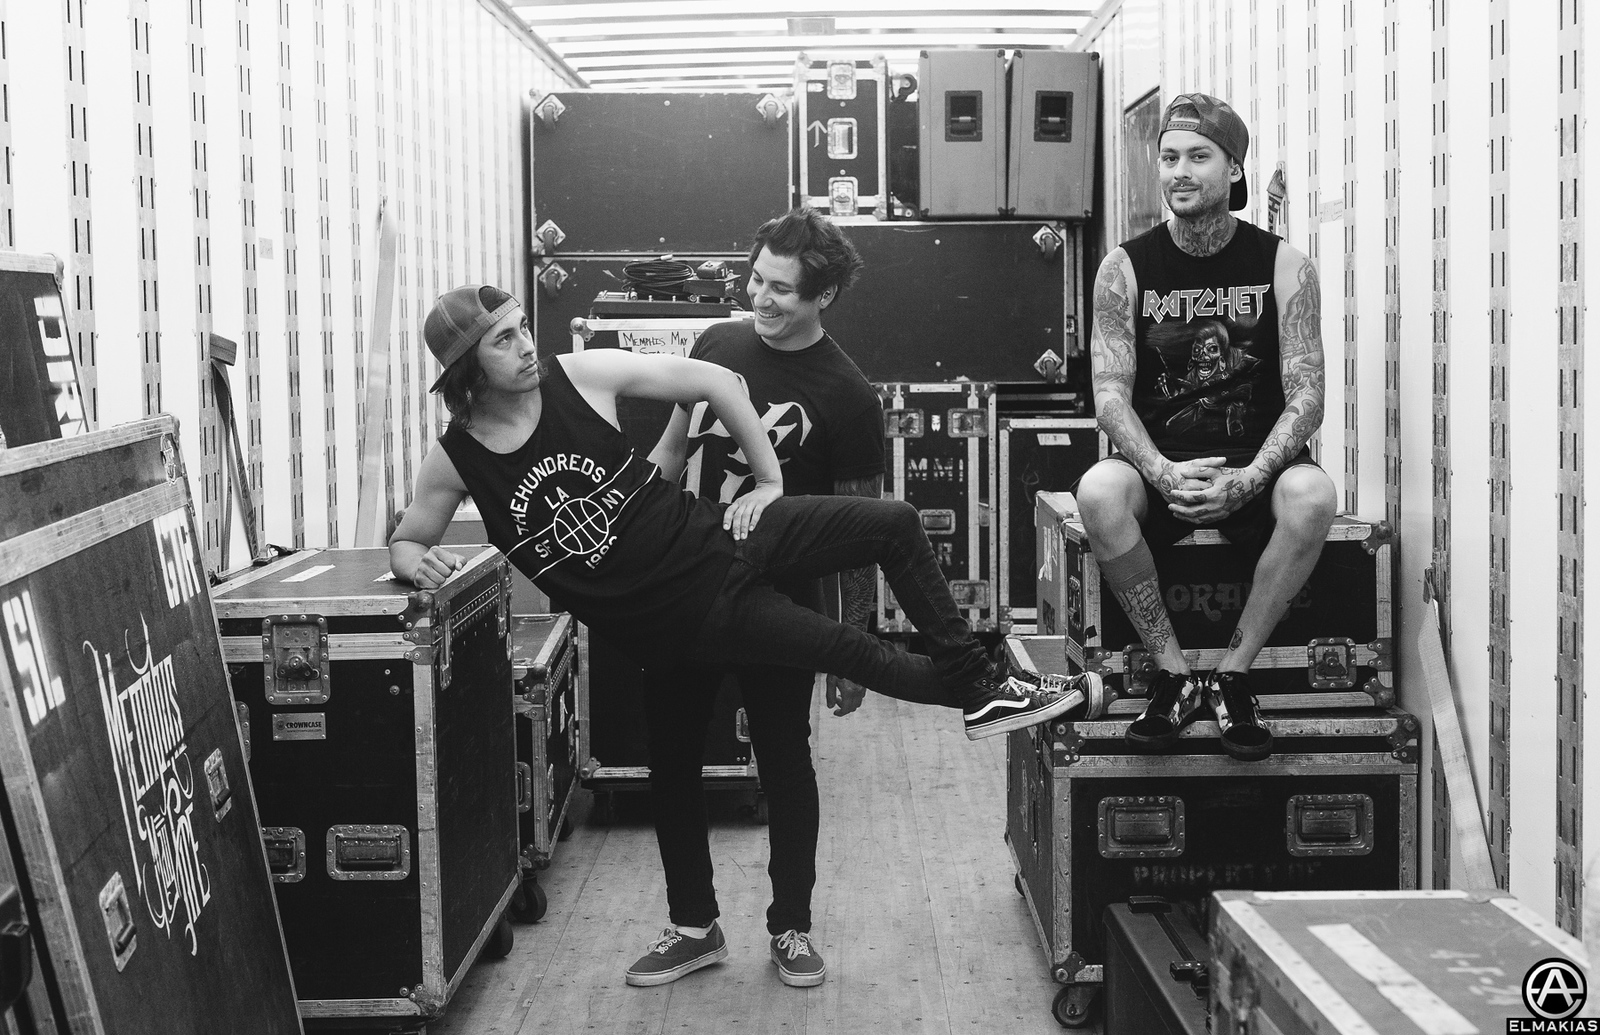 Vic Fuentes, Jaime Preciado, and Mike Fuentes of Pierce the Veil at Warped Tour 2015 by Adam Elmakias